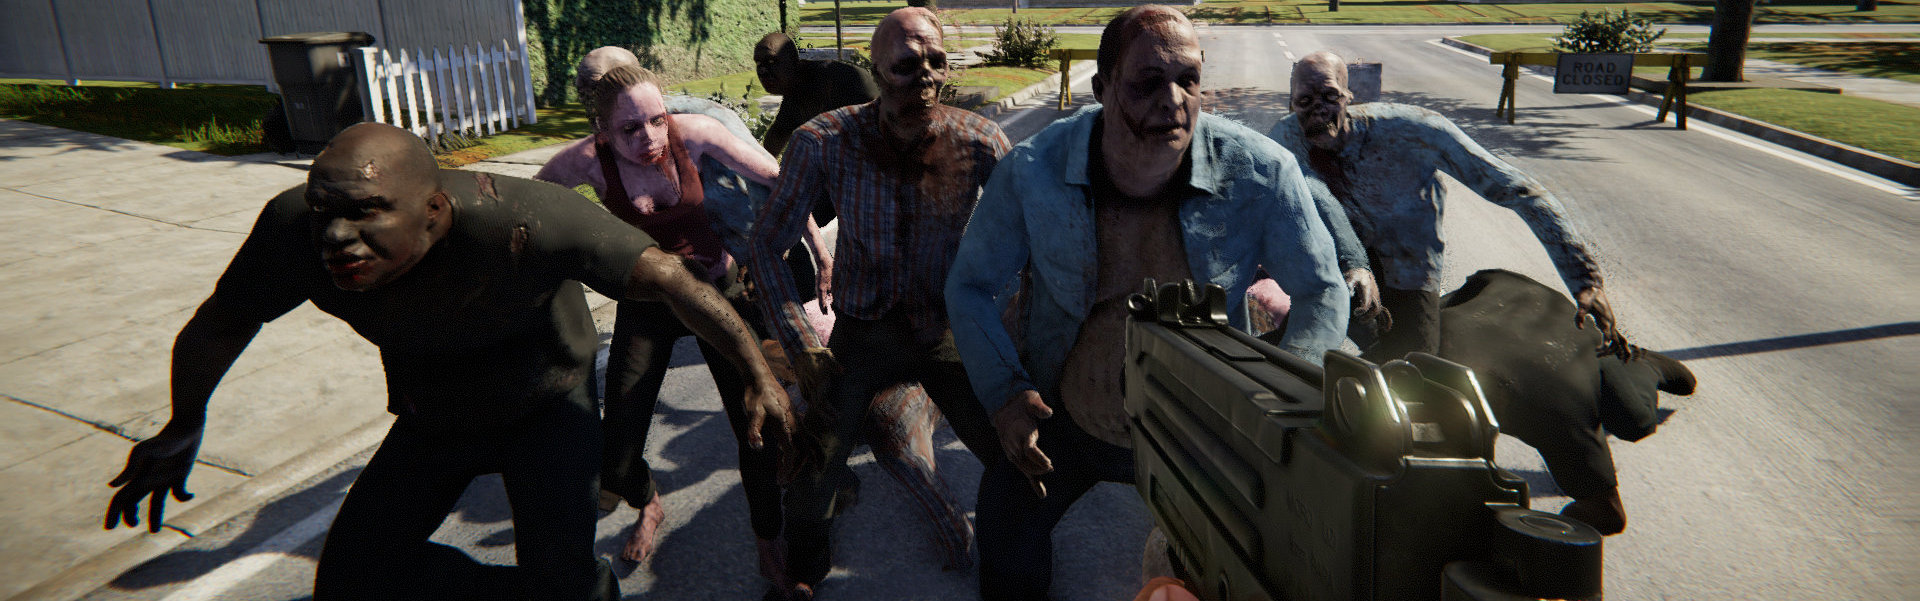 Dead Purge: Outbreak Steam Key GLOBAL